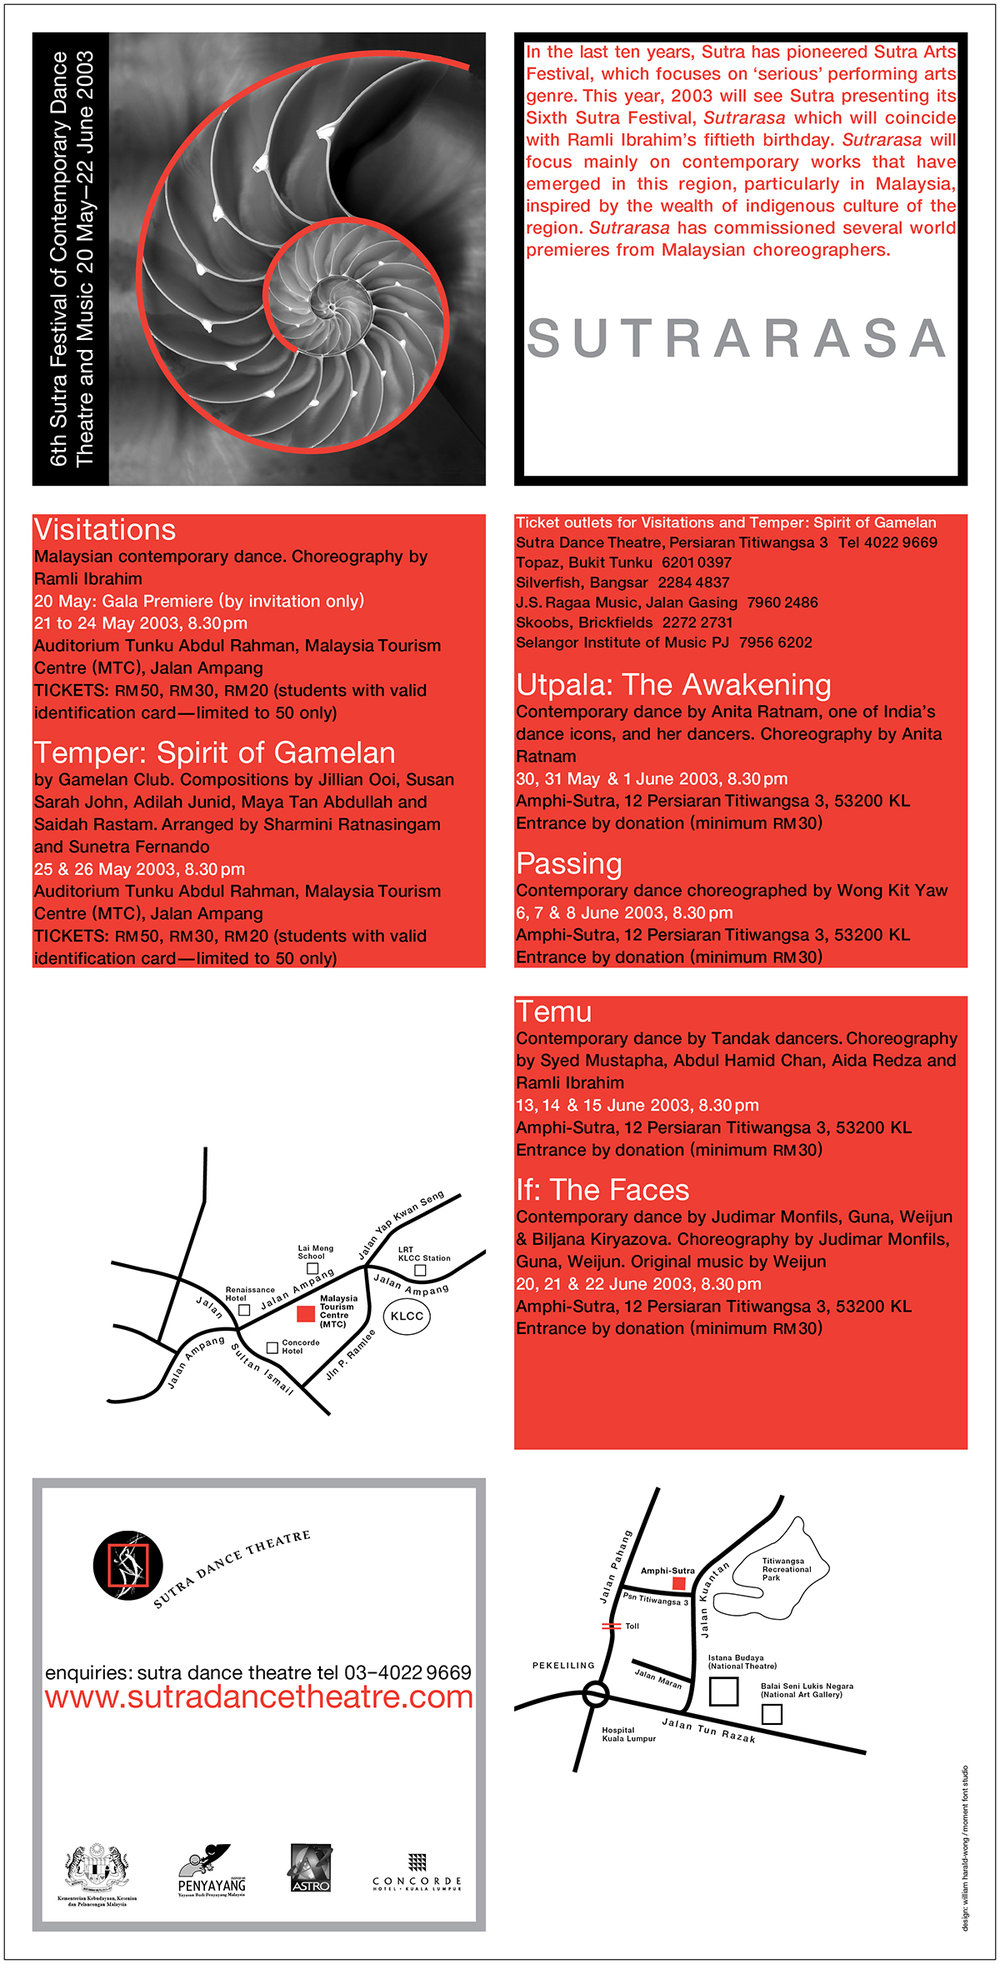 whwWeb_Sutra_Sutrarasa_Leaflet (back)_border.jpg